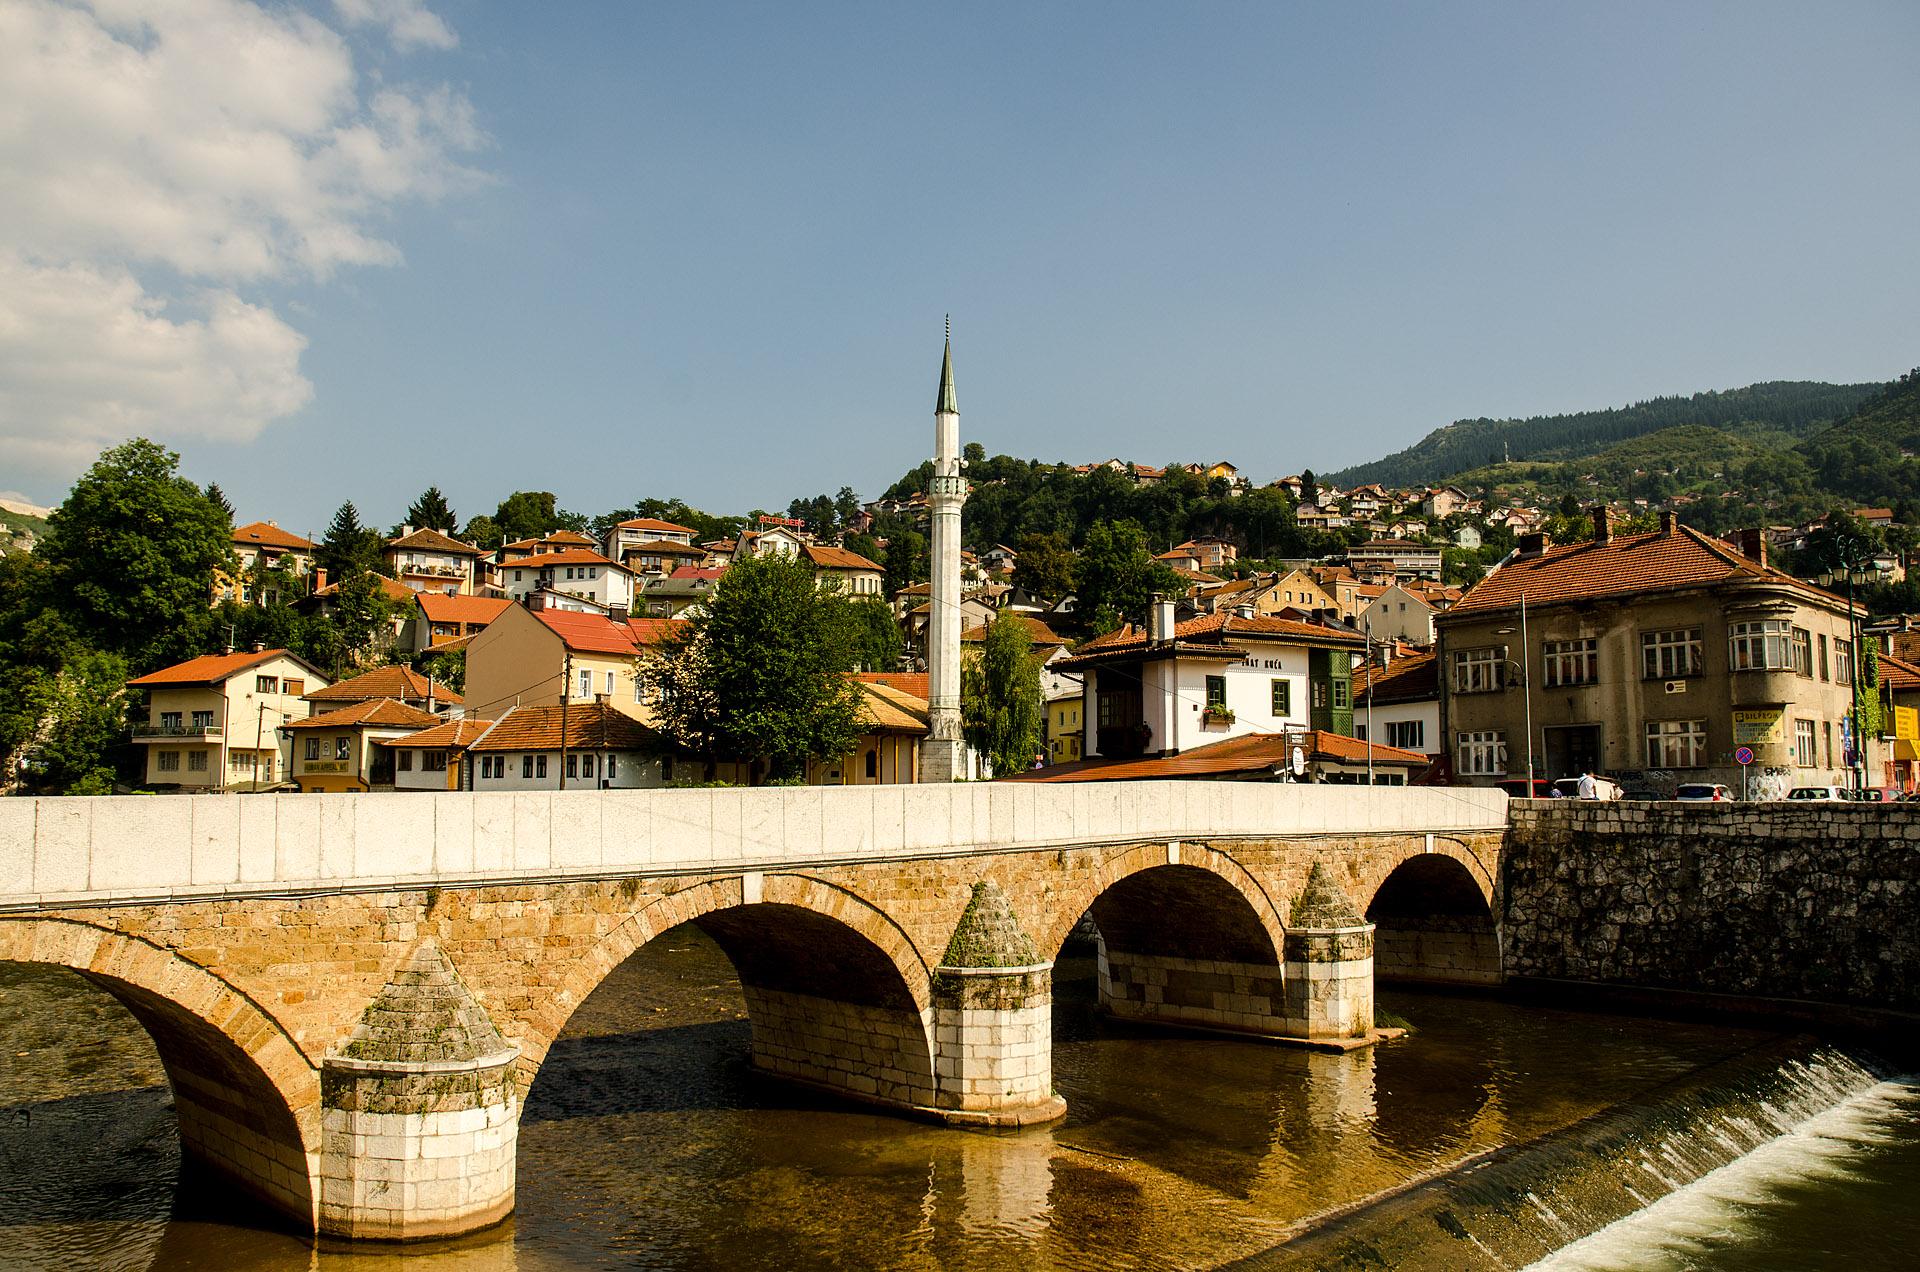 Seher-Cehaja Bridge